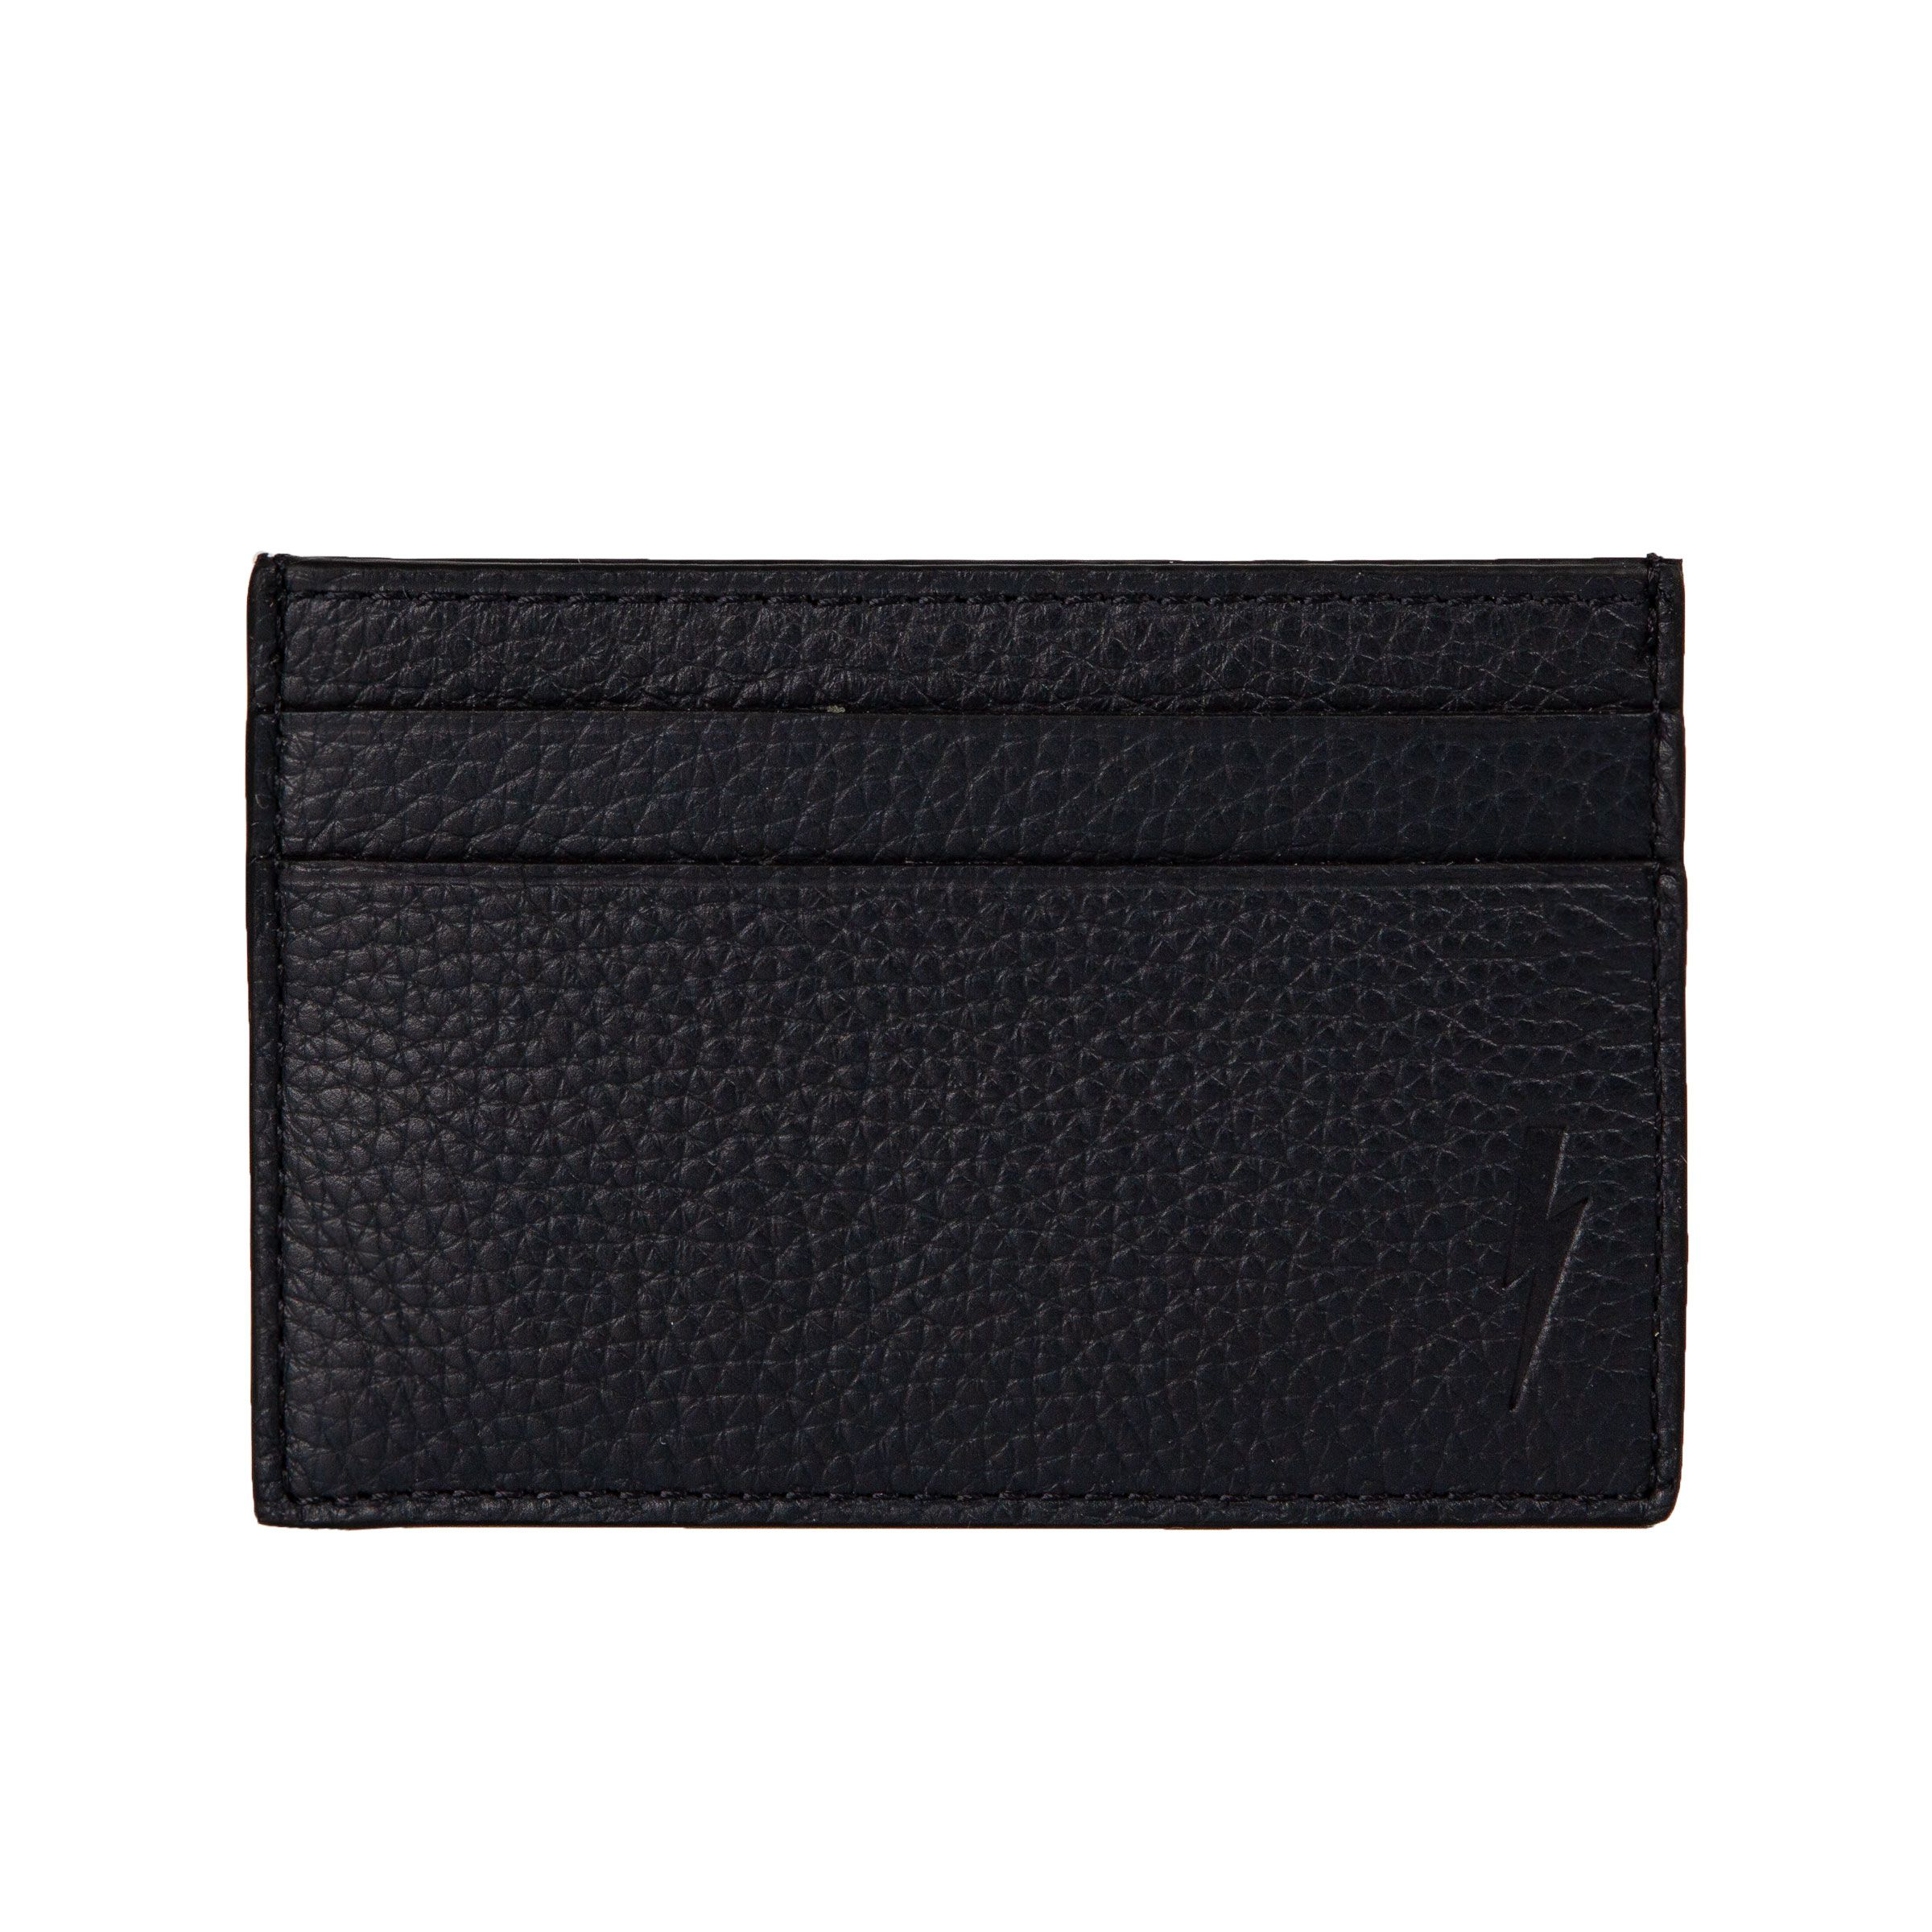 Neil Barrett Men's Wallet Black BSG901X9200_01BLACK